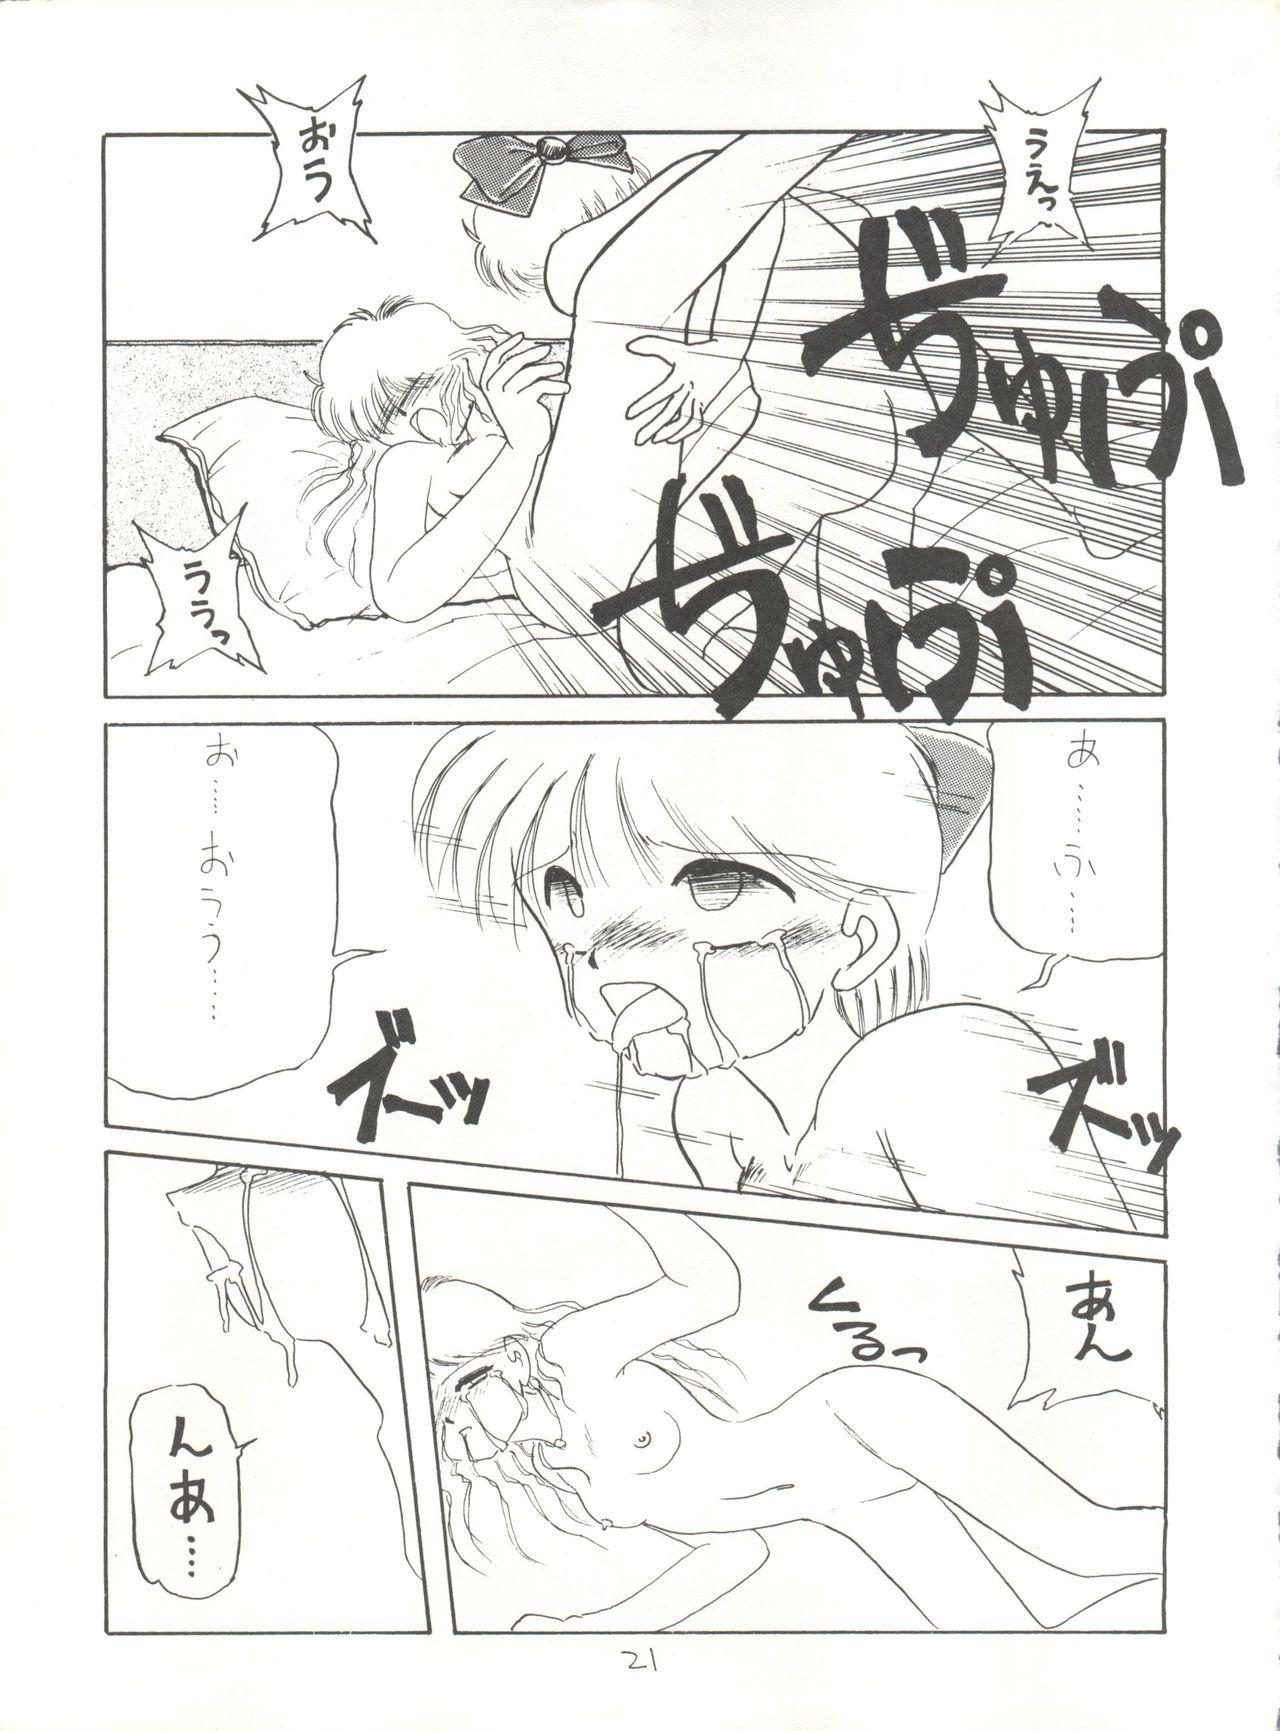 [Global One (MARO)] Sadistic 5 (Cutey Honey, Devilman, Sailor Moon), [Global One (MARO)] Sadistic (Dirty Pair, Fushigi no Umi no Nadia, Sailor Moon), [Studio Ikkatsumajin] .ribbon (Hime-chan's Ribbon) 144